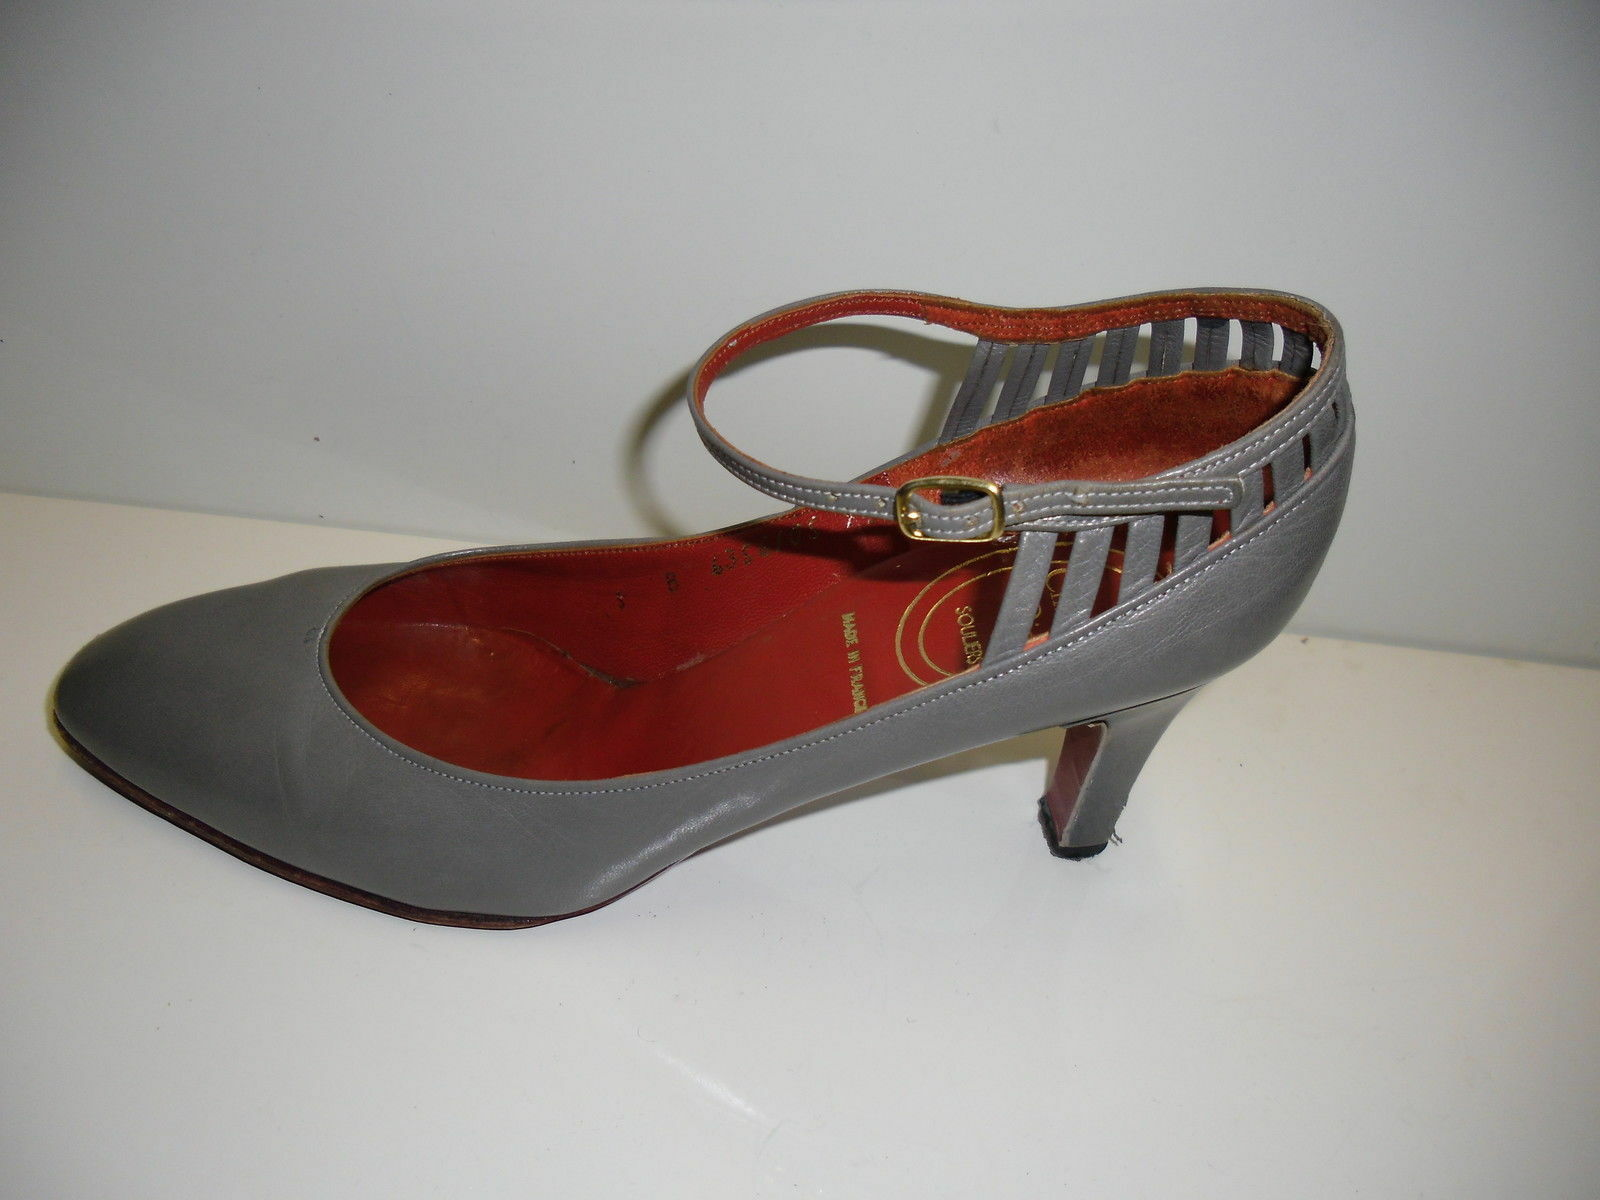 Christian Dior Vintage Schuhe Pumps Leder Grau Farbe  Gr. 35,5 Rarität